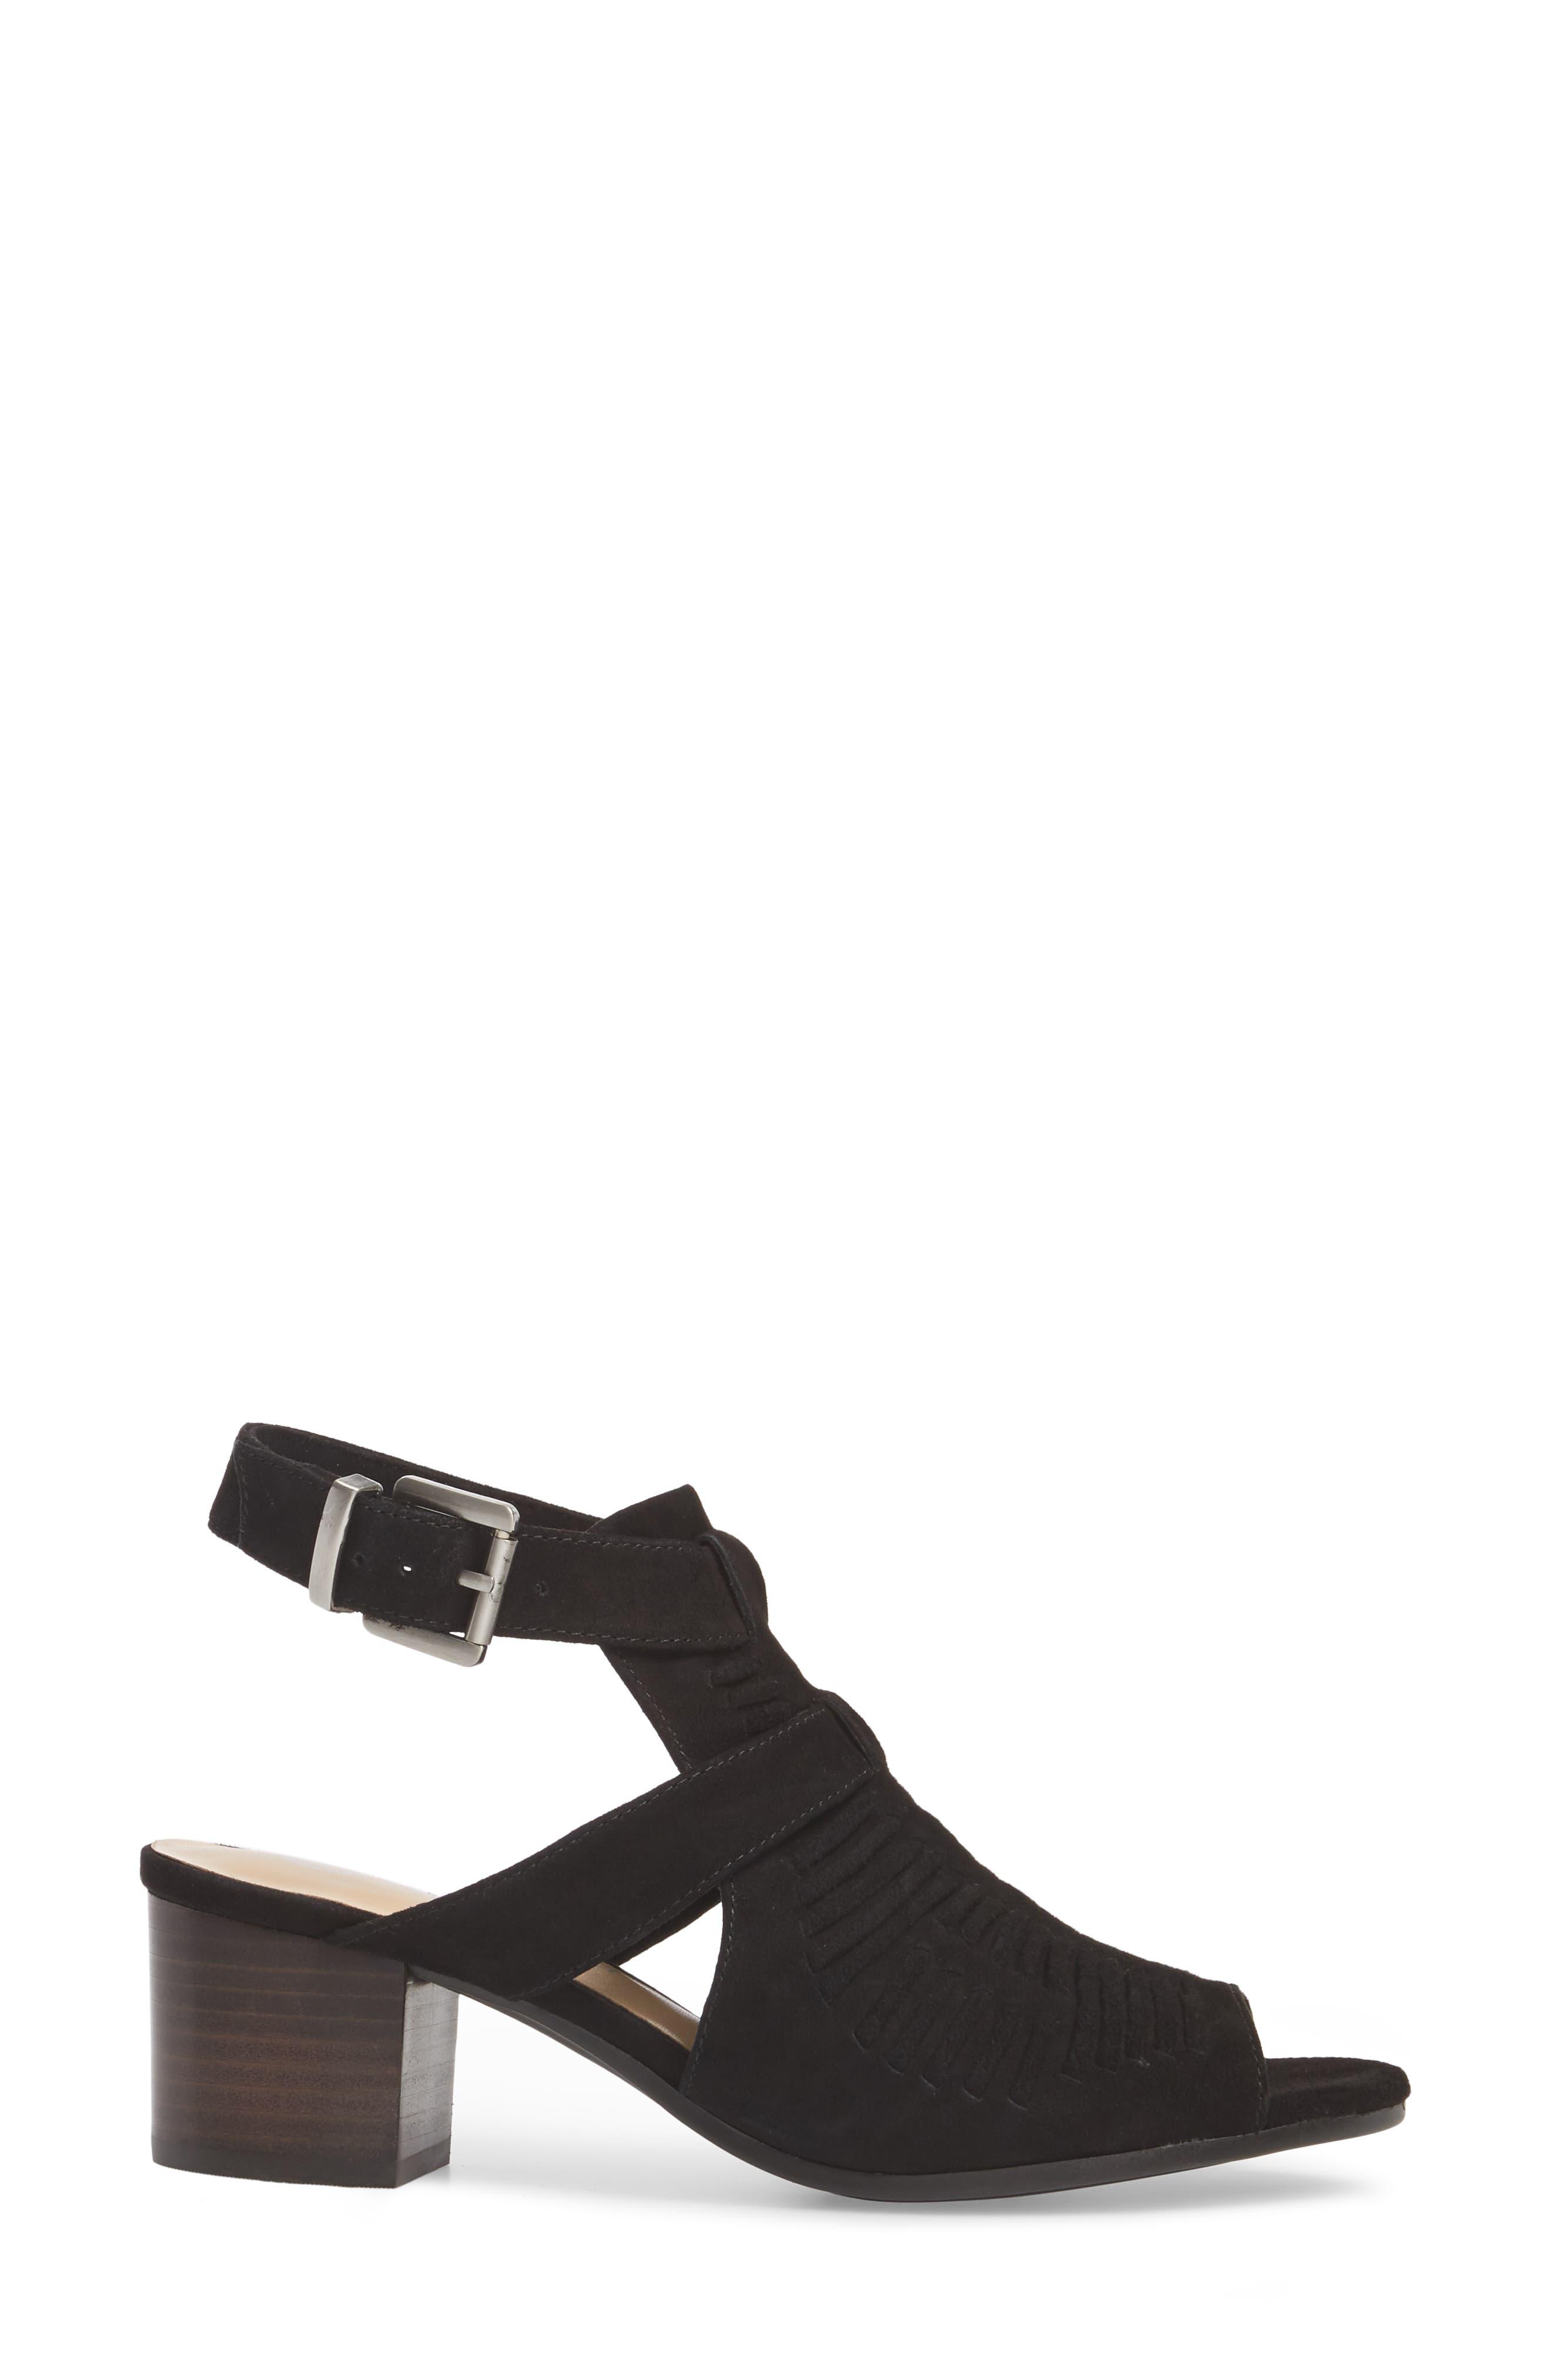 Finley Ankle Strap Sandal,                             Alternate thumbnail 3, color,                             Black Suede